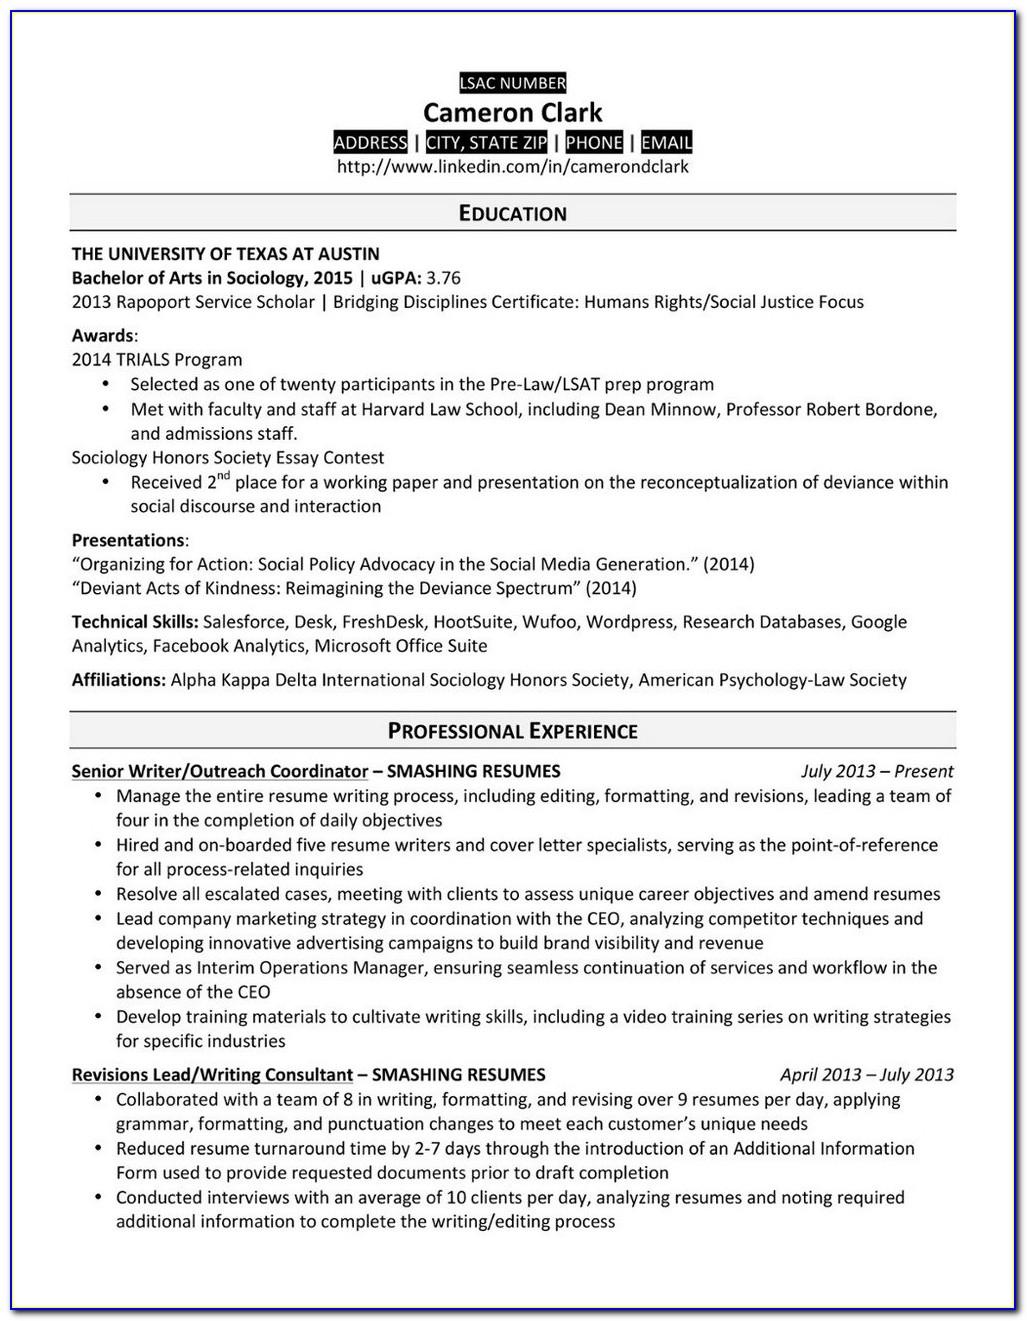 Resume Building Atlanta Ga